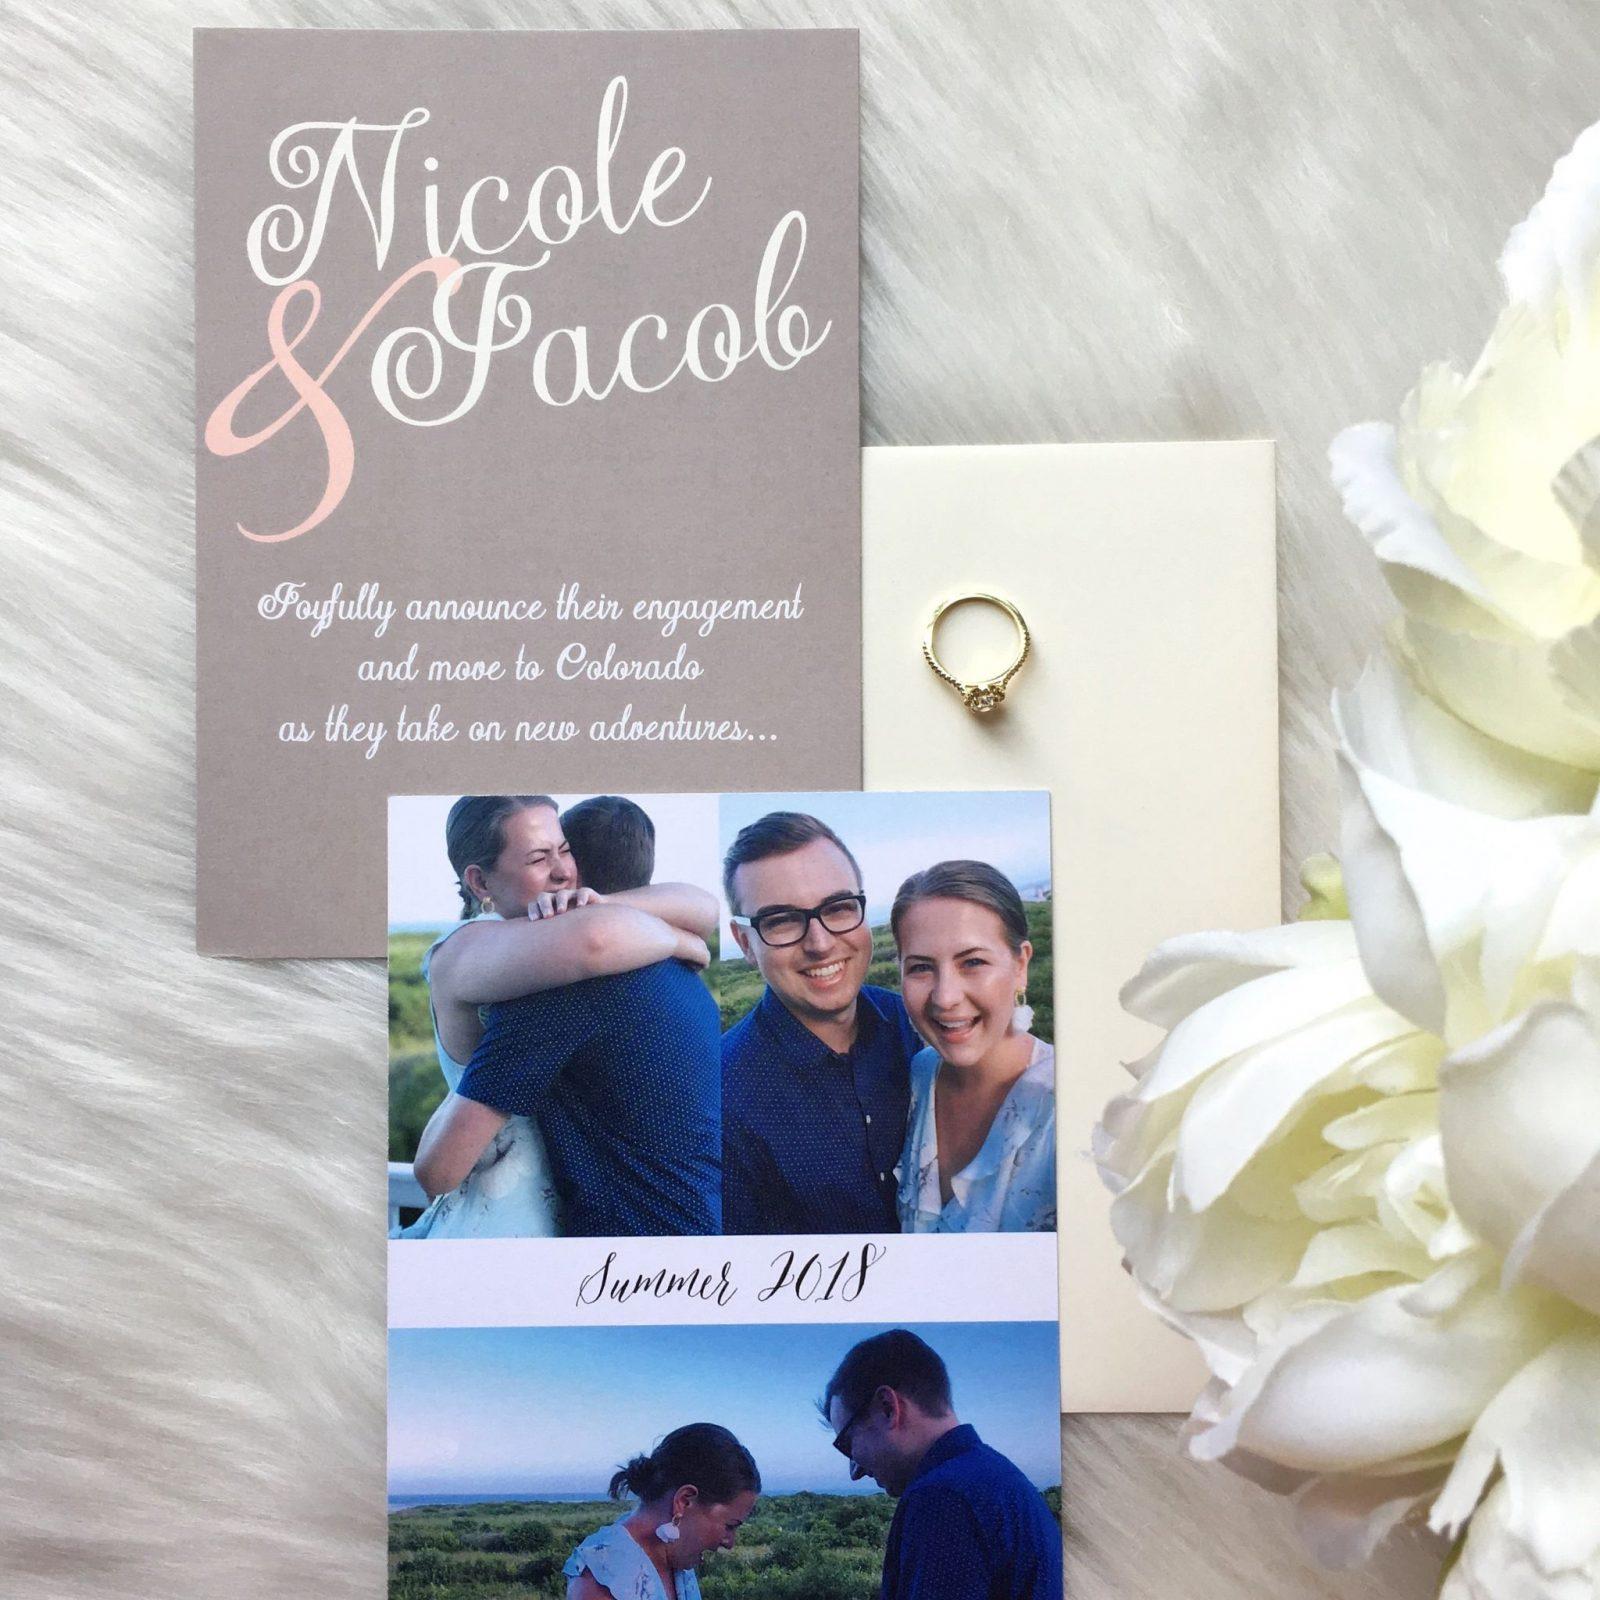 #WeddingWednesday: Modern Invitations